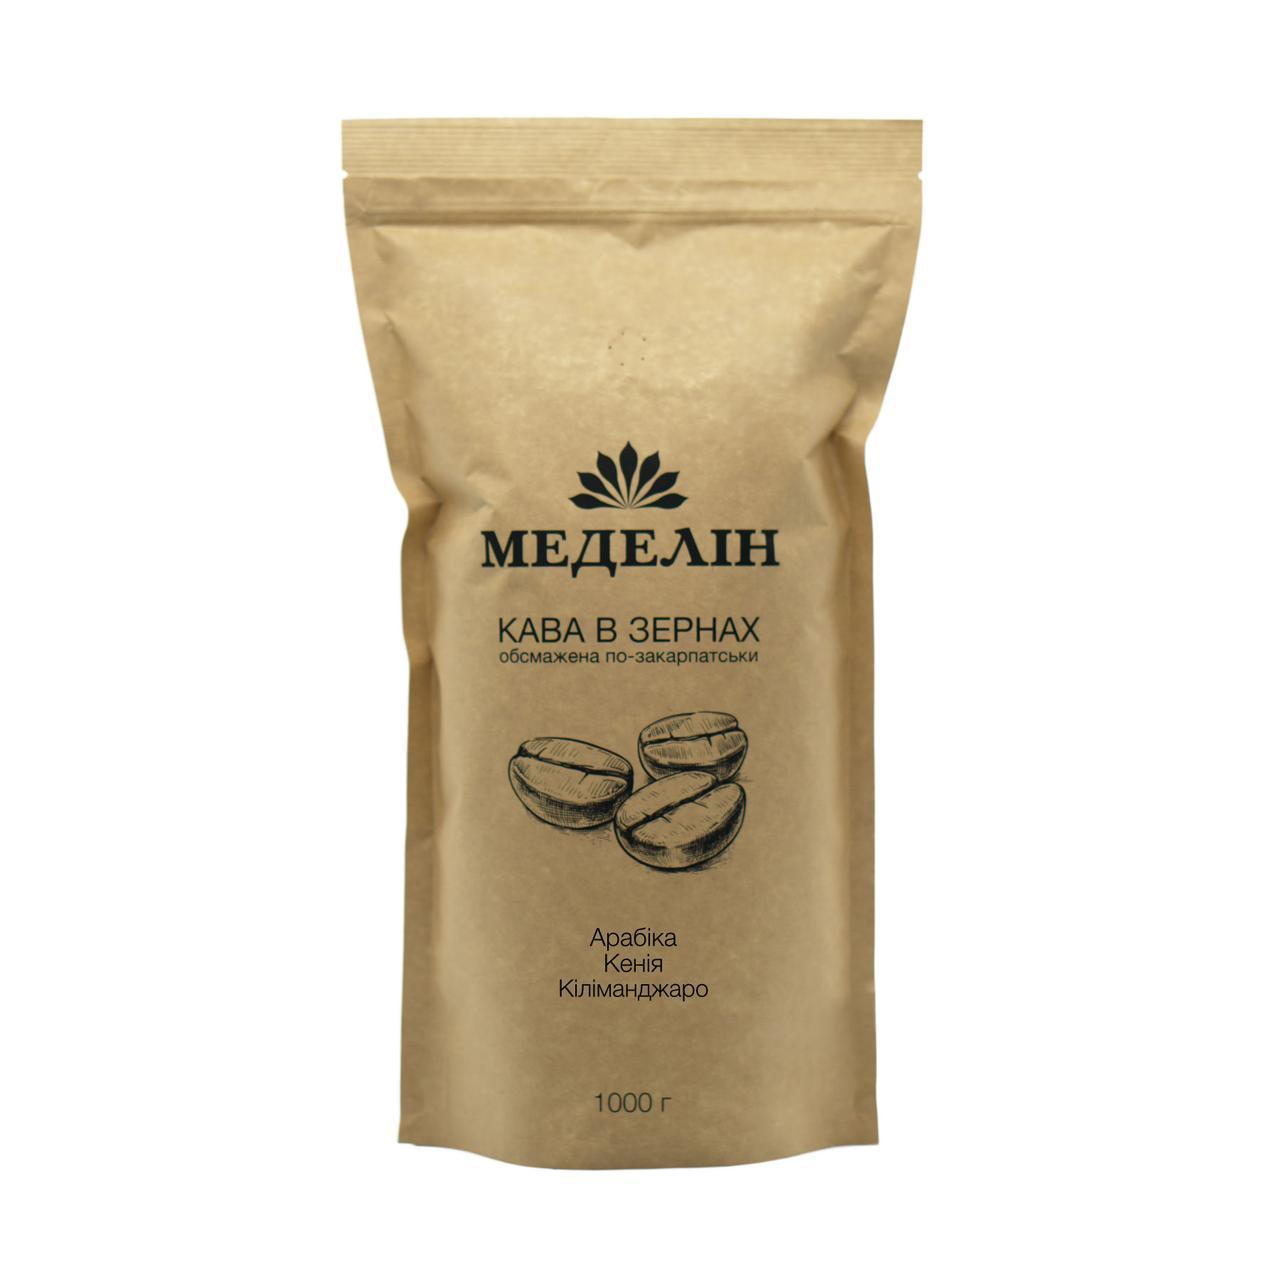 Кофе Меделін арабика колумбия эксельсо, 1000г